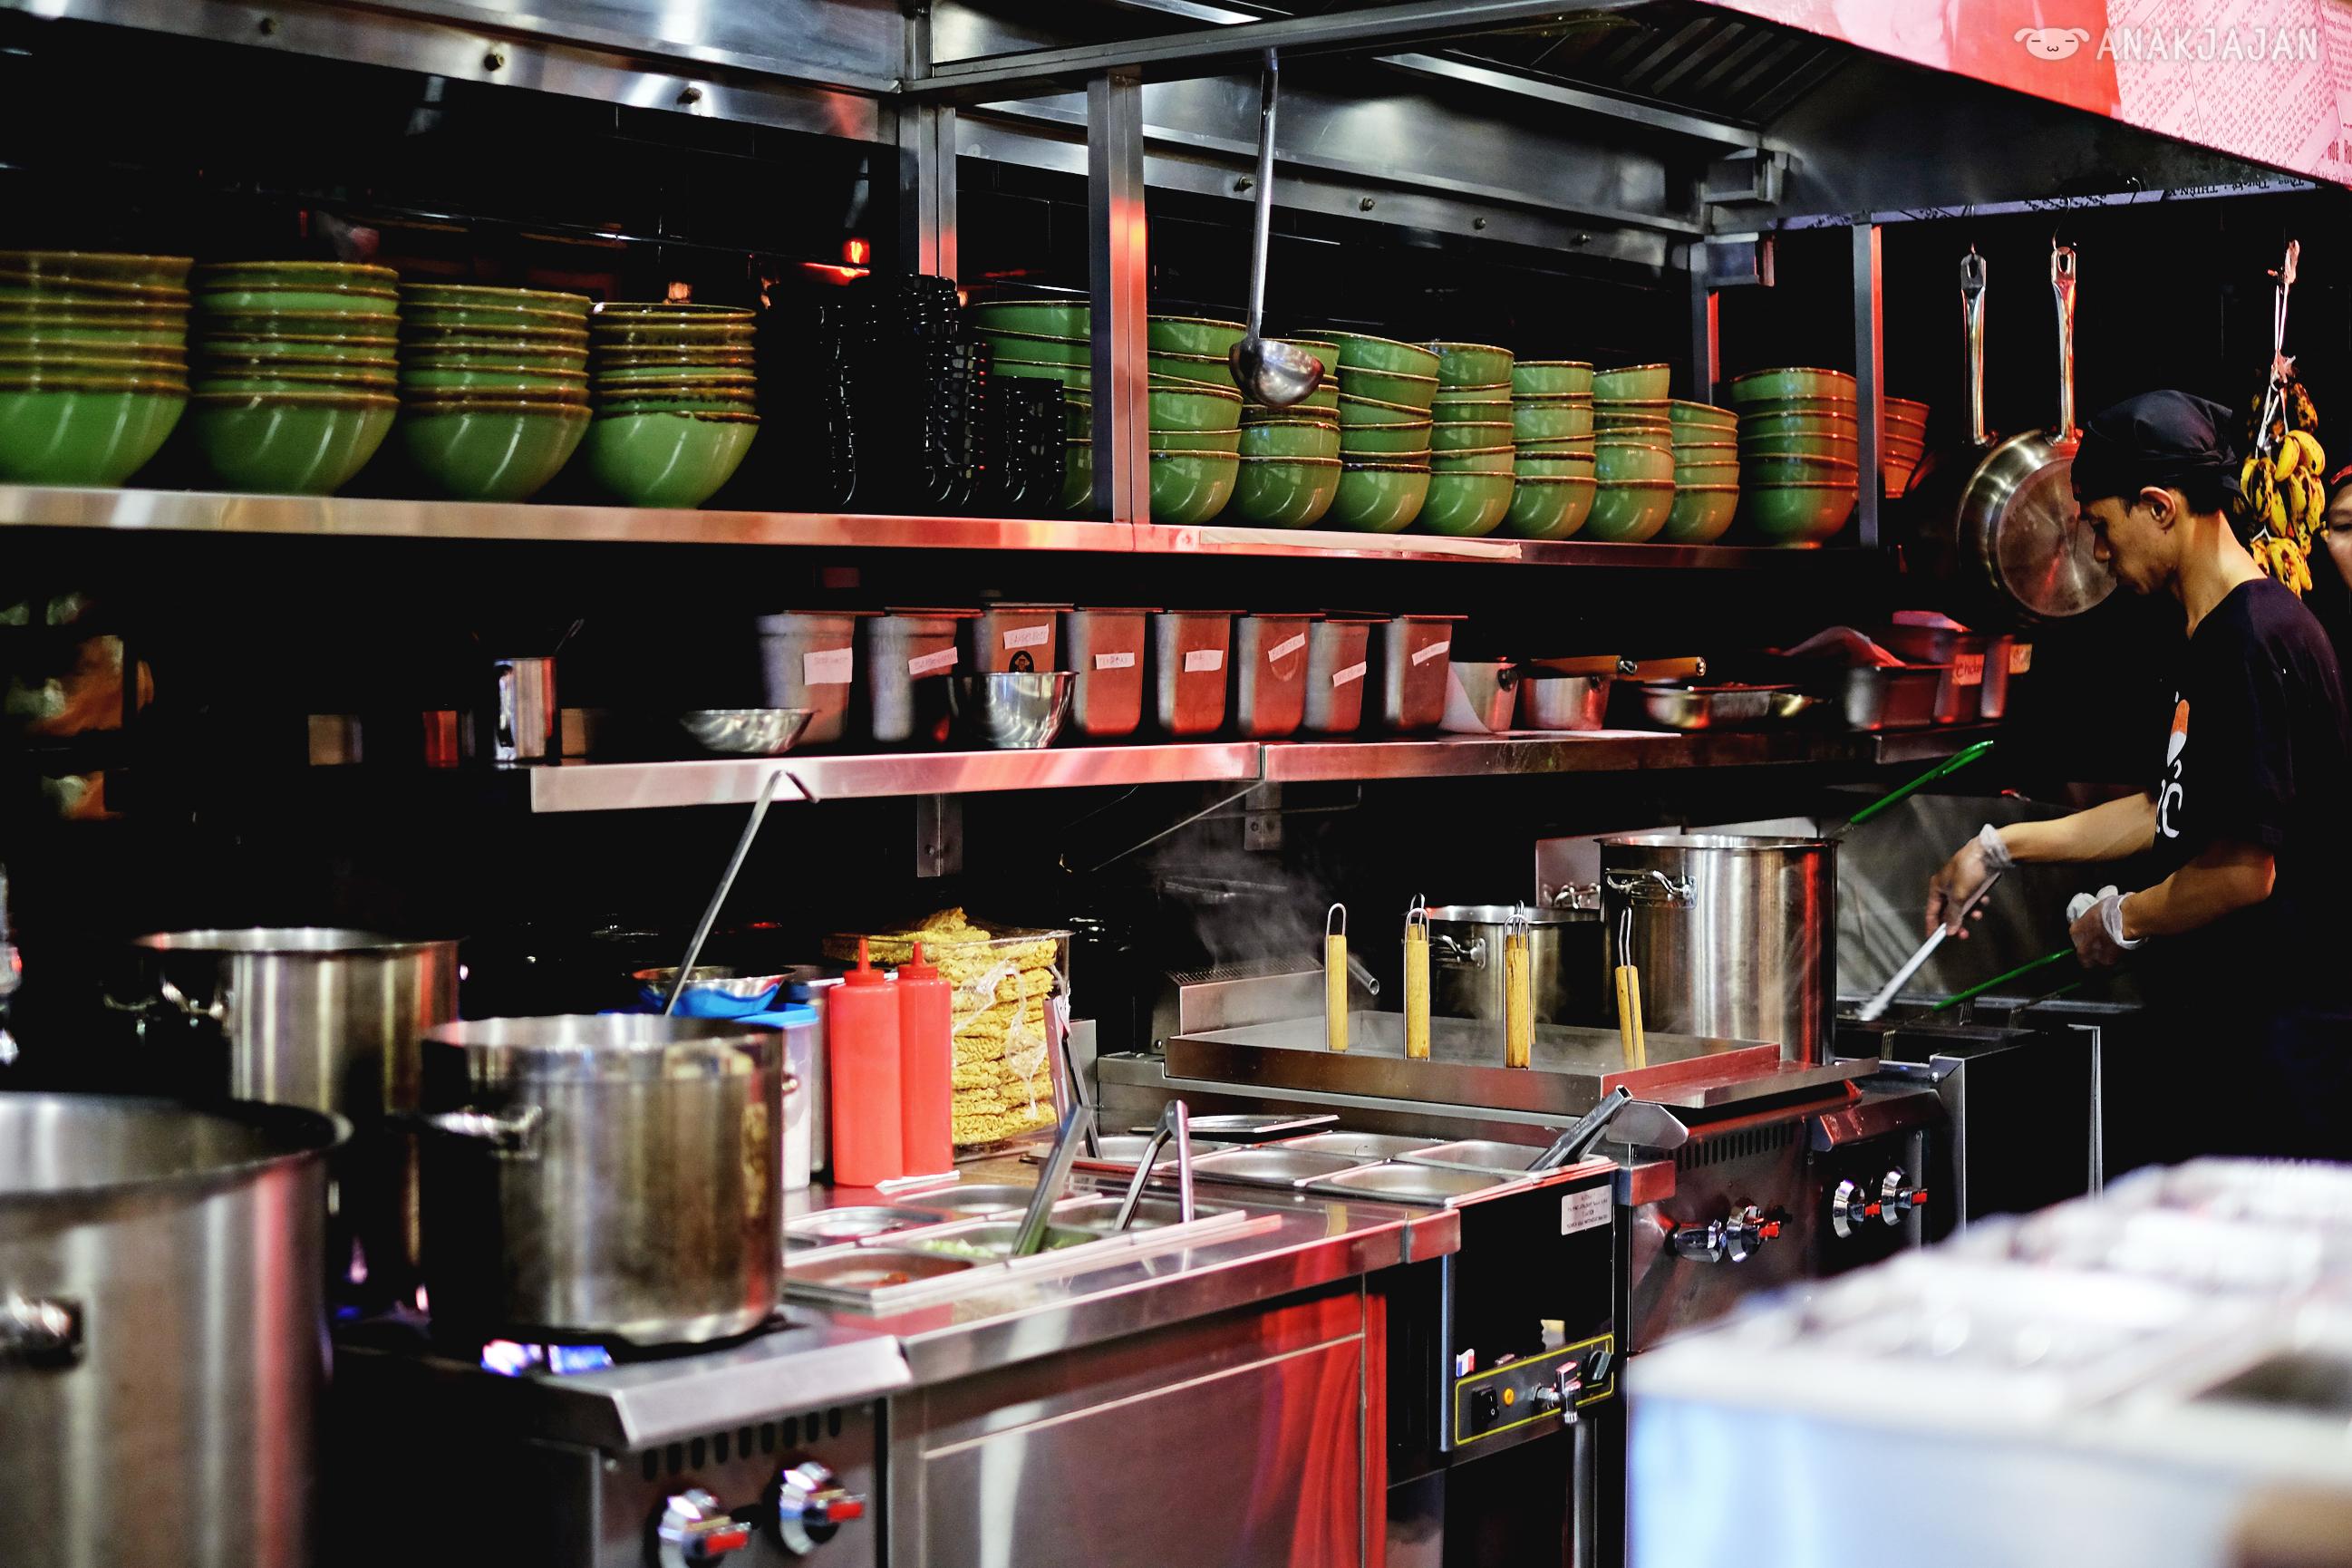 Namnam noodle bar pik jakarta anakjajan com for Food bar pik